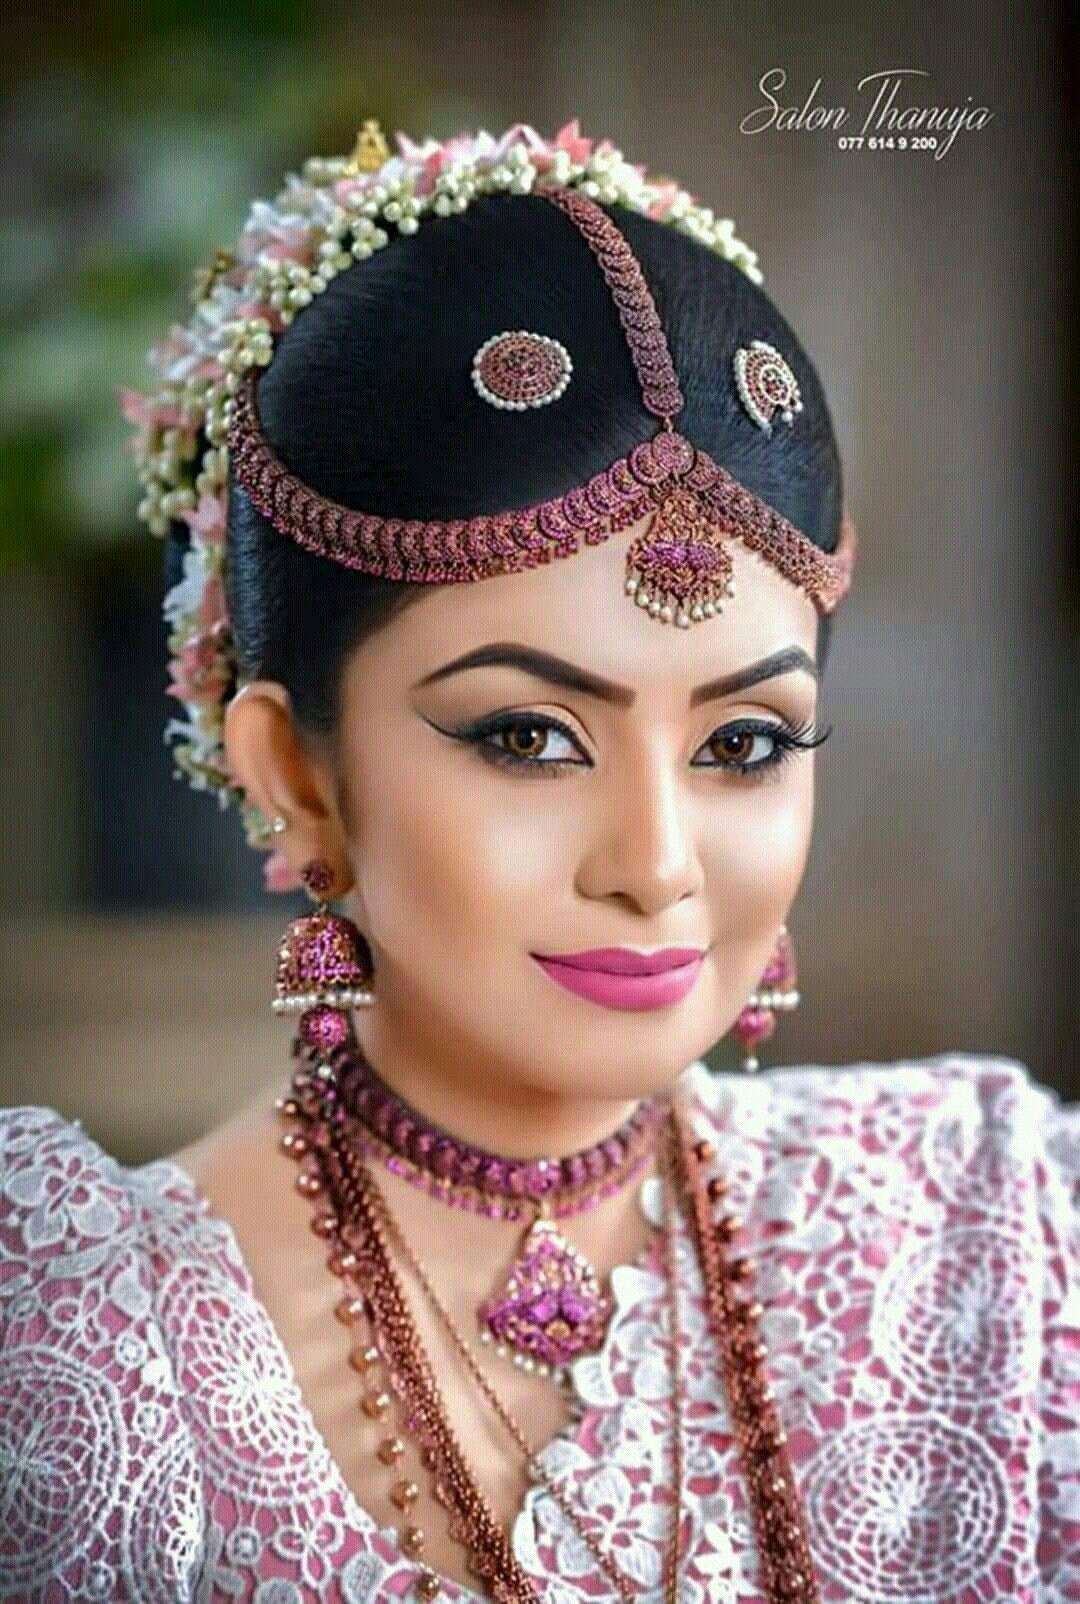 Hairstyles For Wedding In Sri Lanka